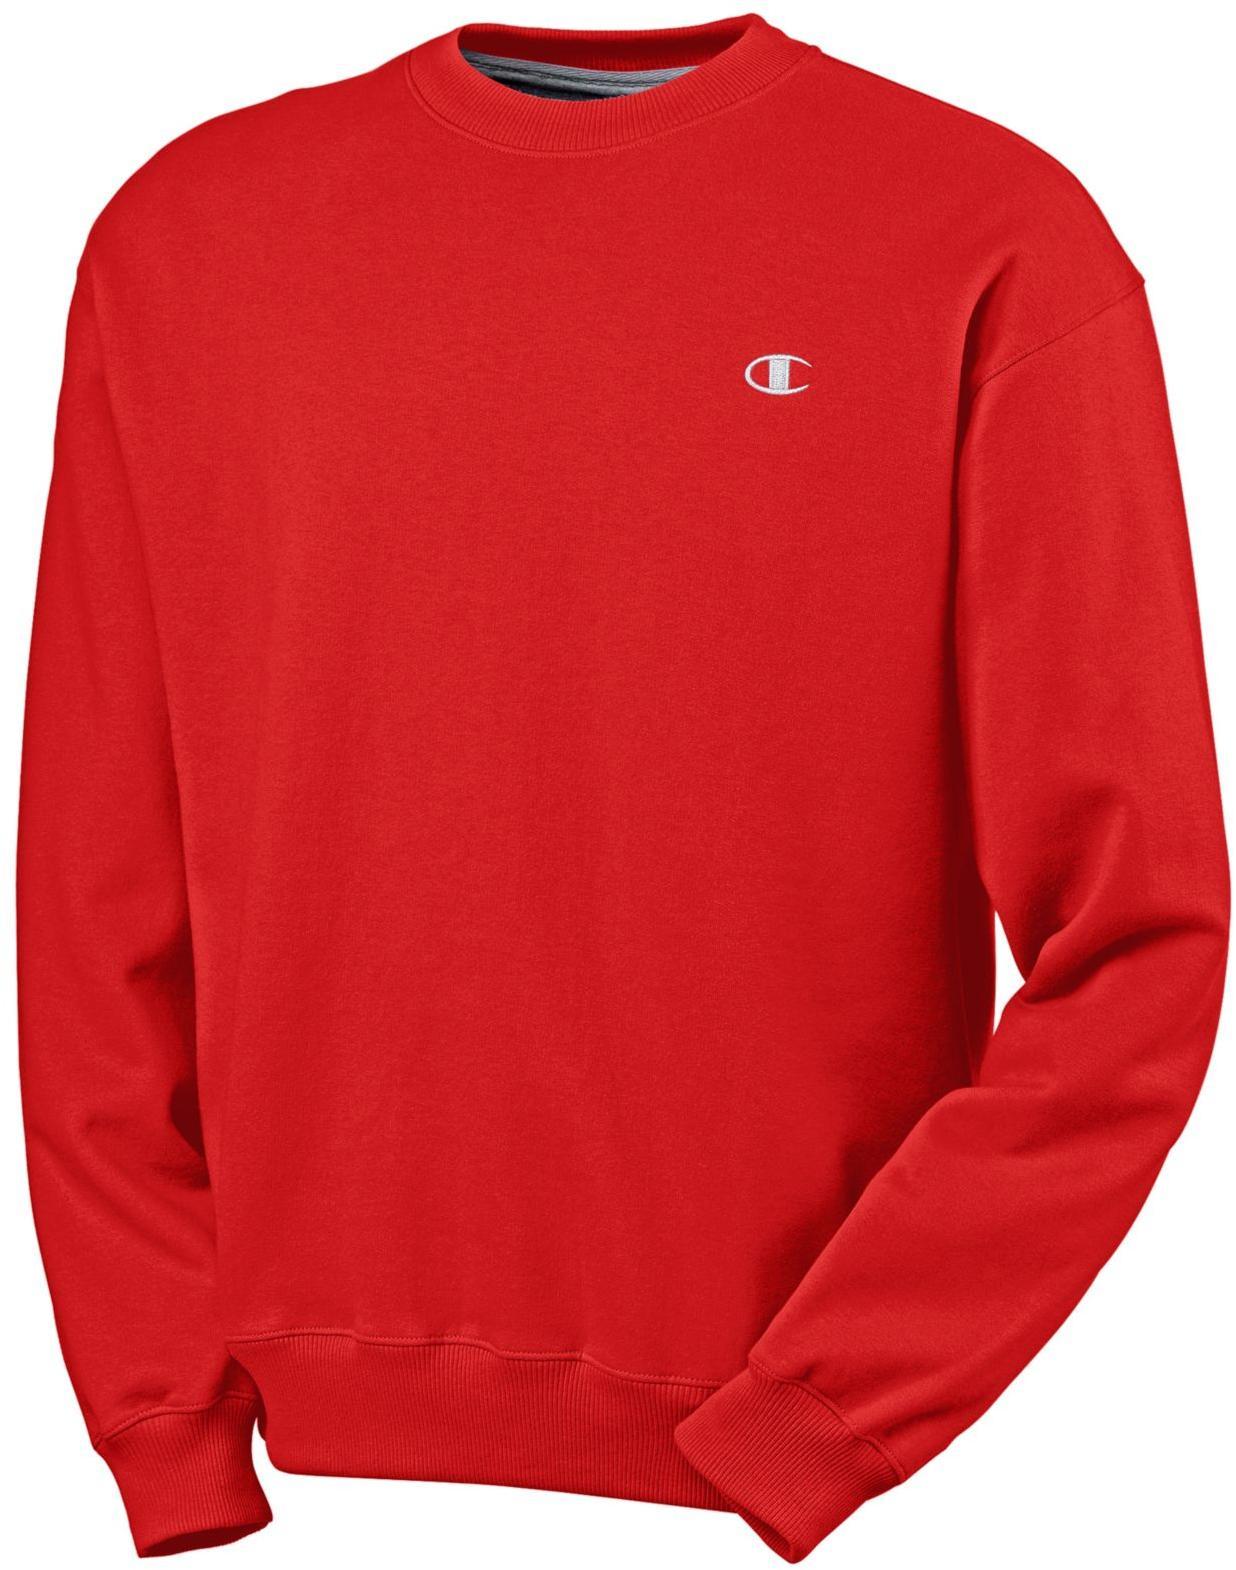 CHAMPION Eco Fleece Crewneck Men's Sweatshirt - S2465 | eBay